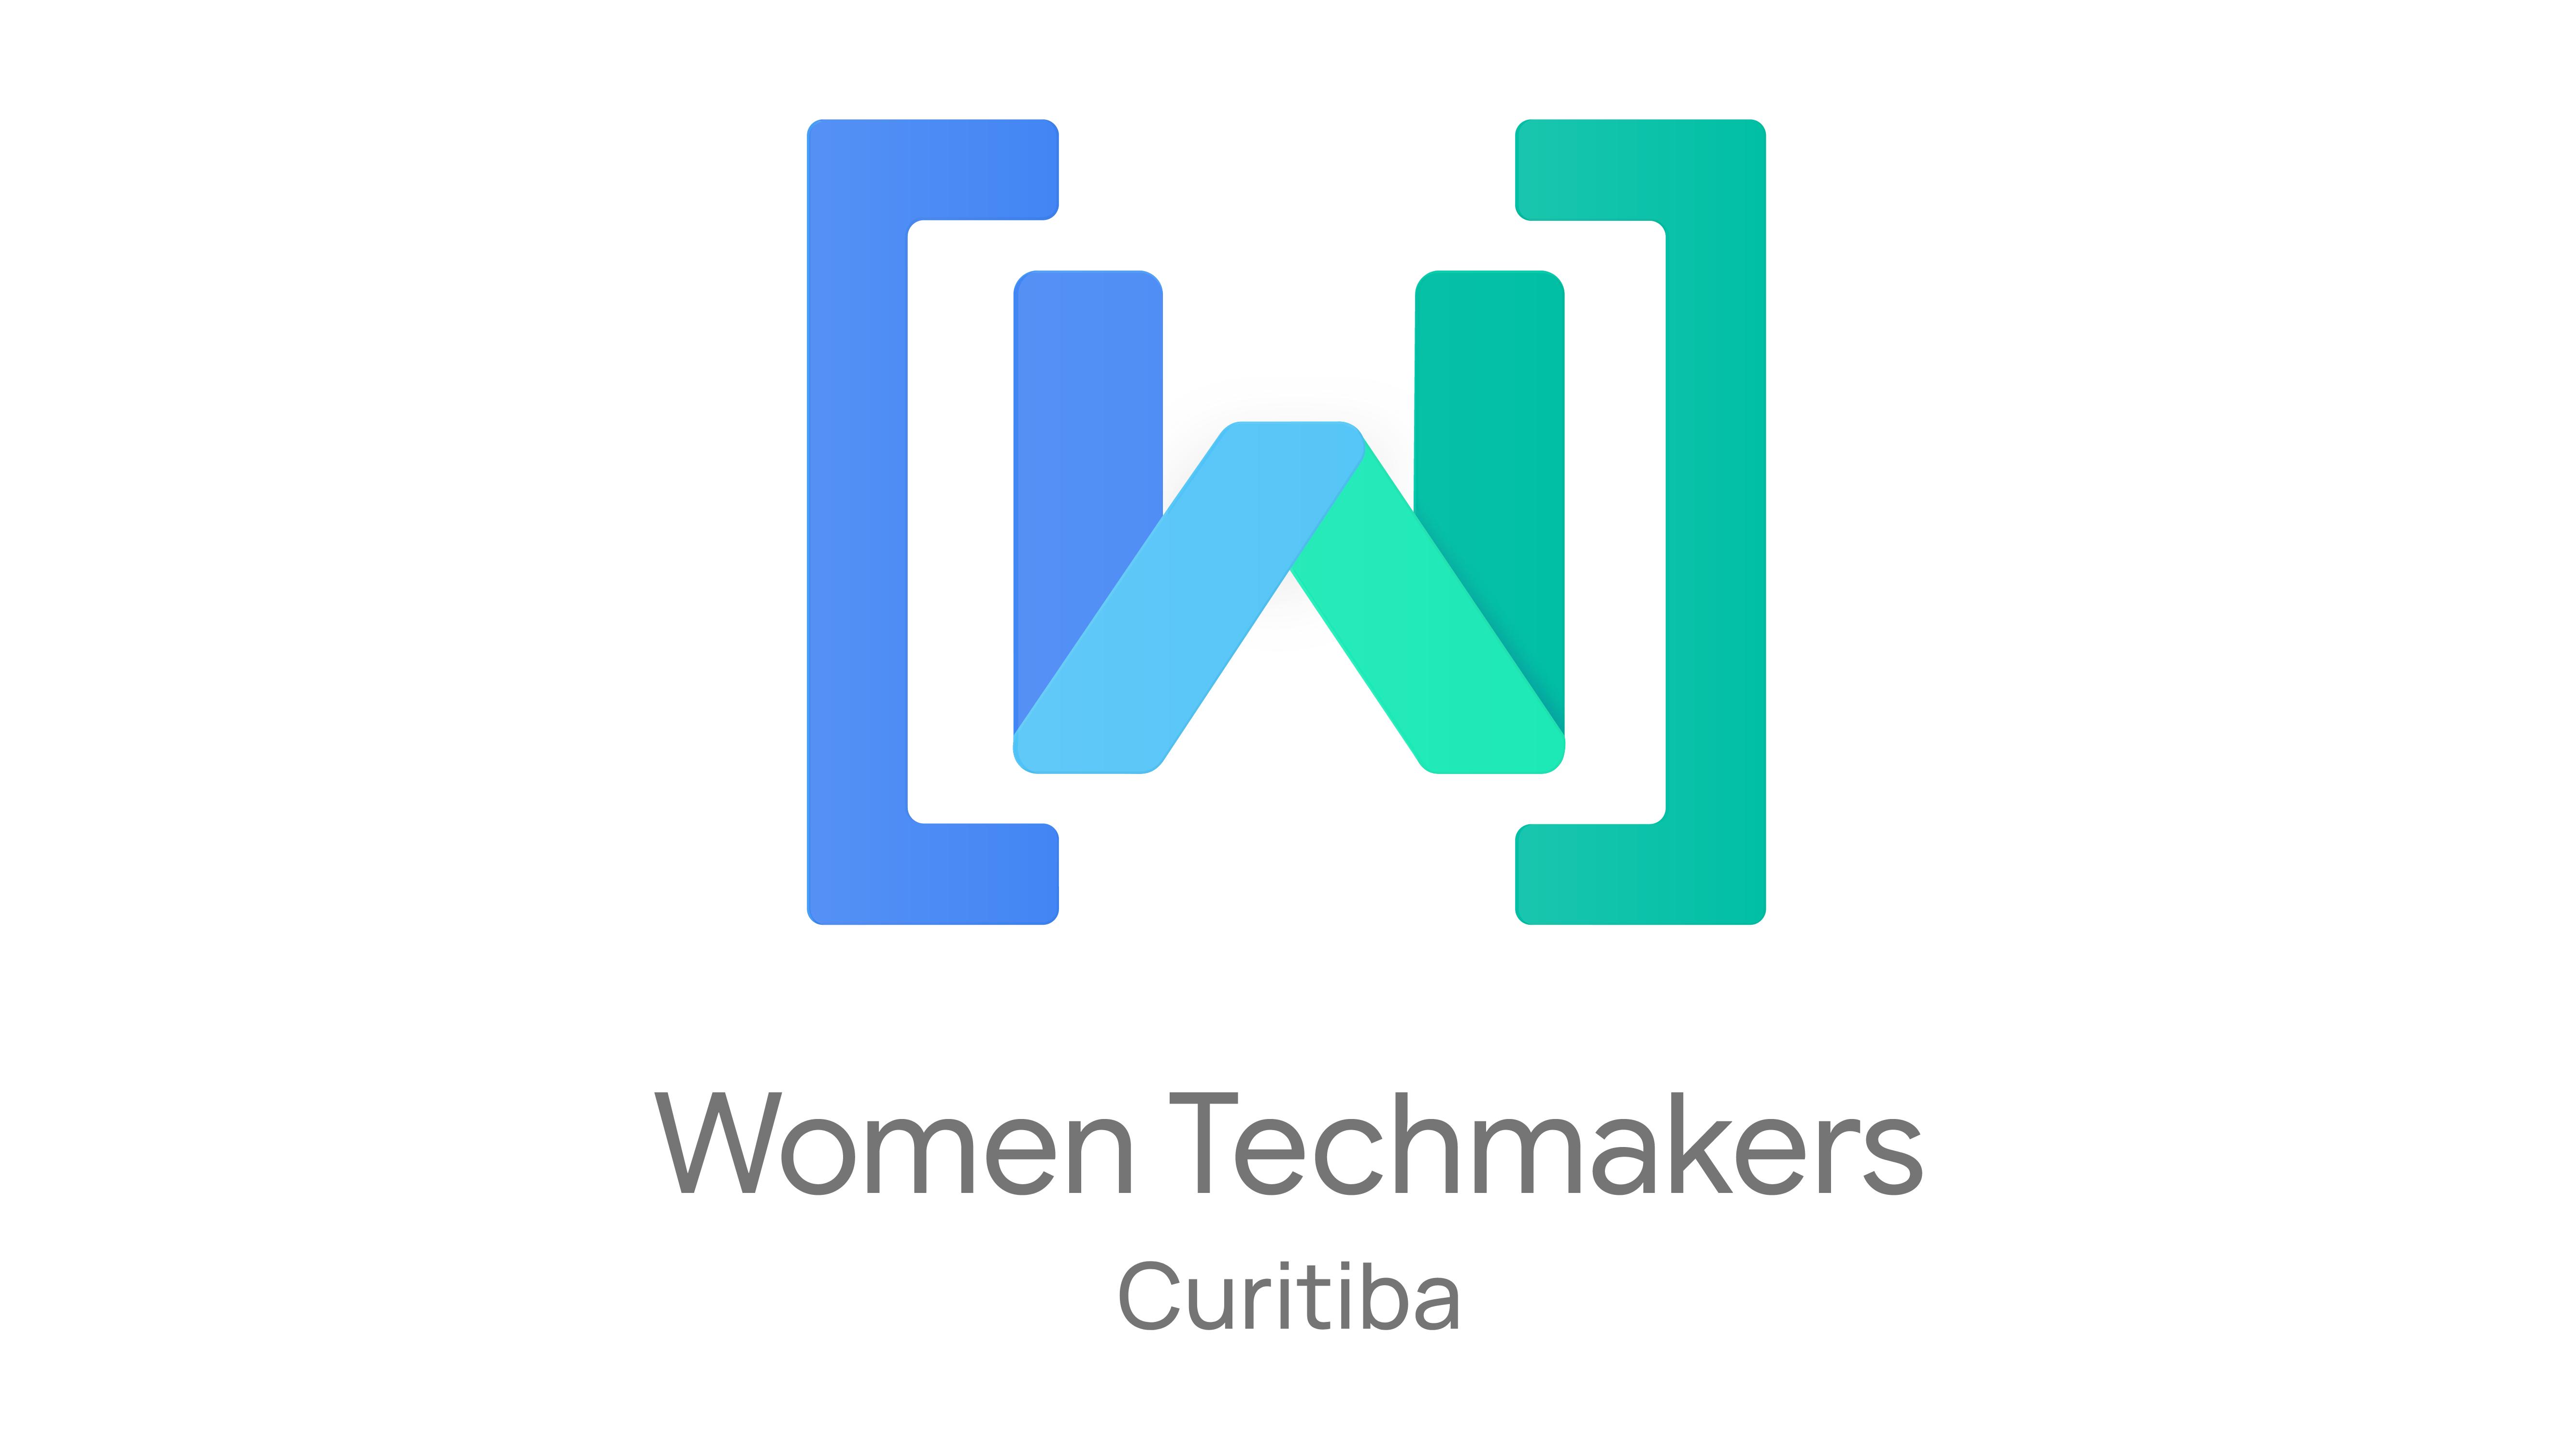 Women Techmakers Curitiba